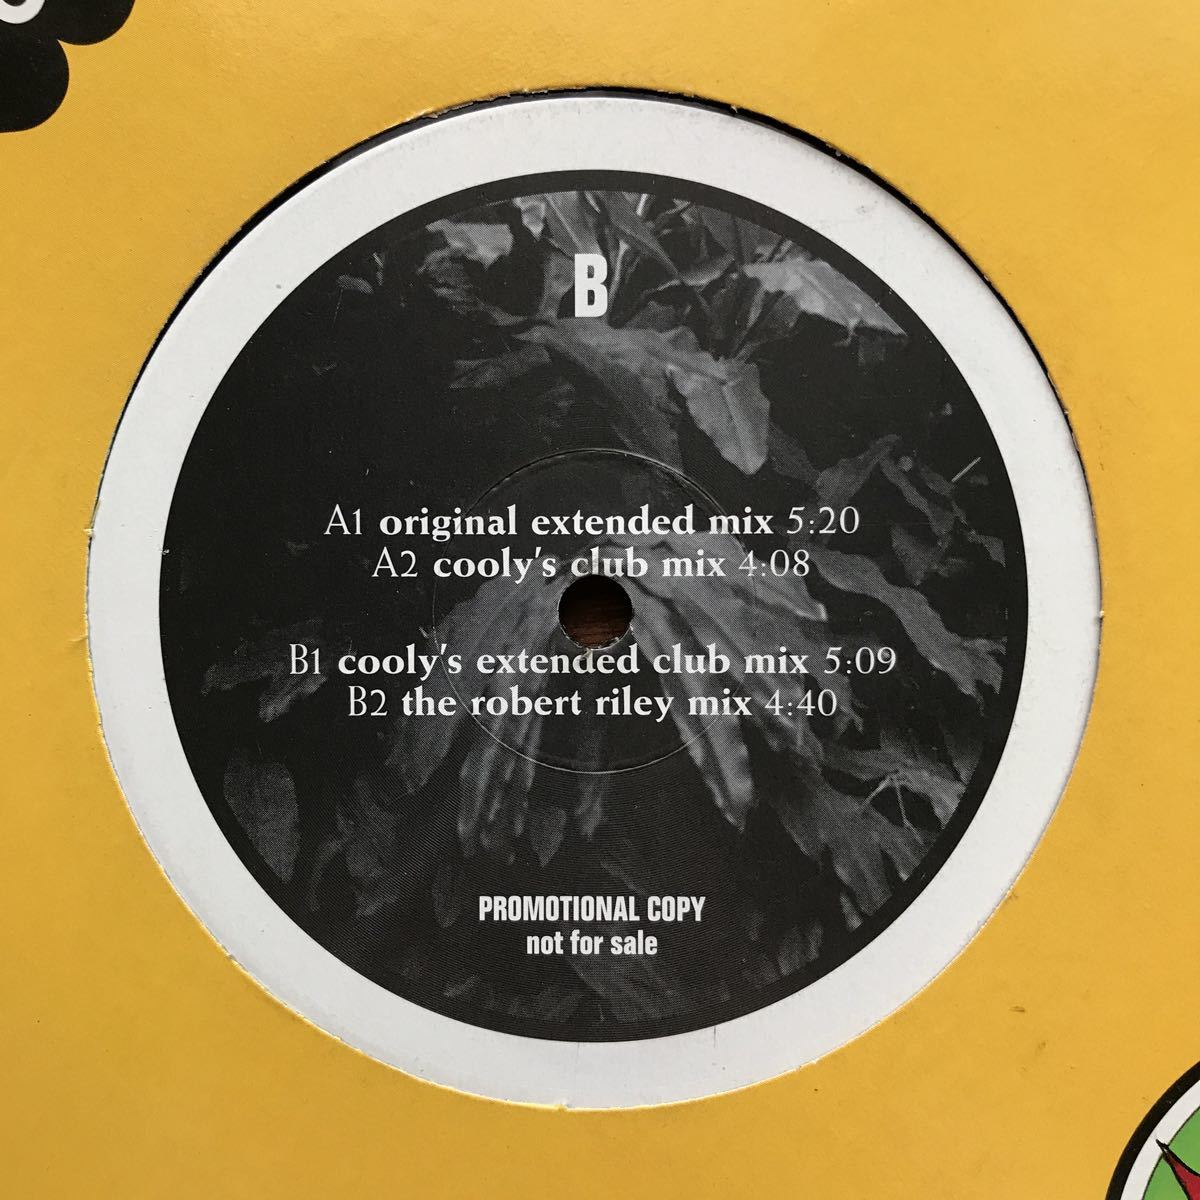 【eu-rap】Winston / Secret Garden[12inch]オリジナル盤《1-4》nightown レーベル